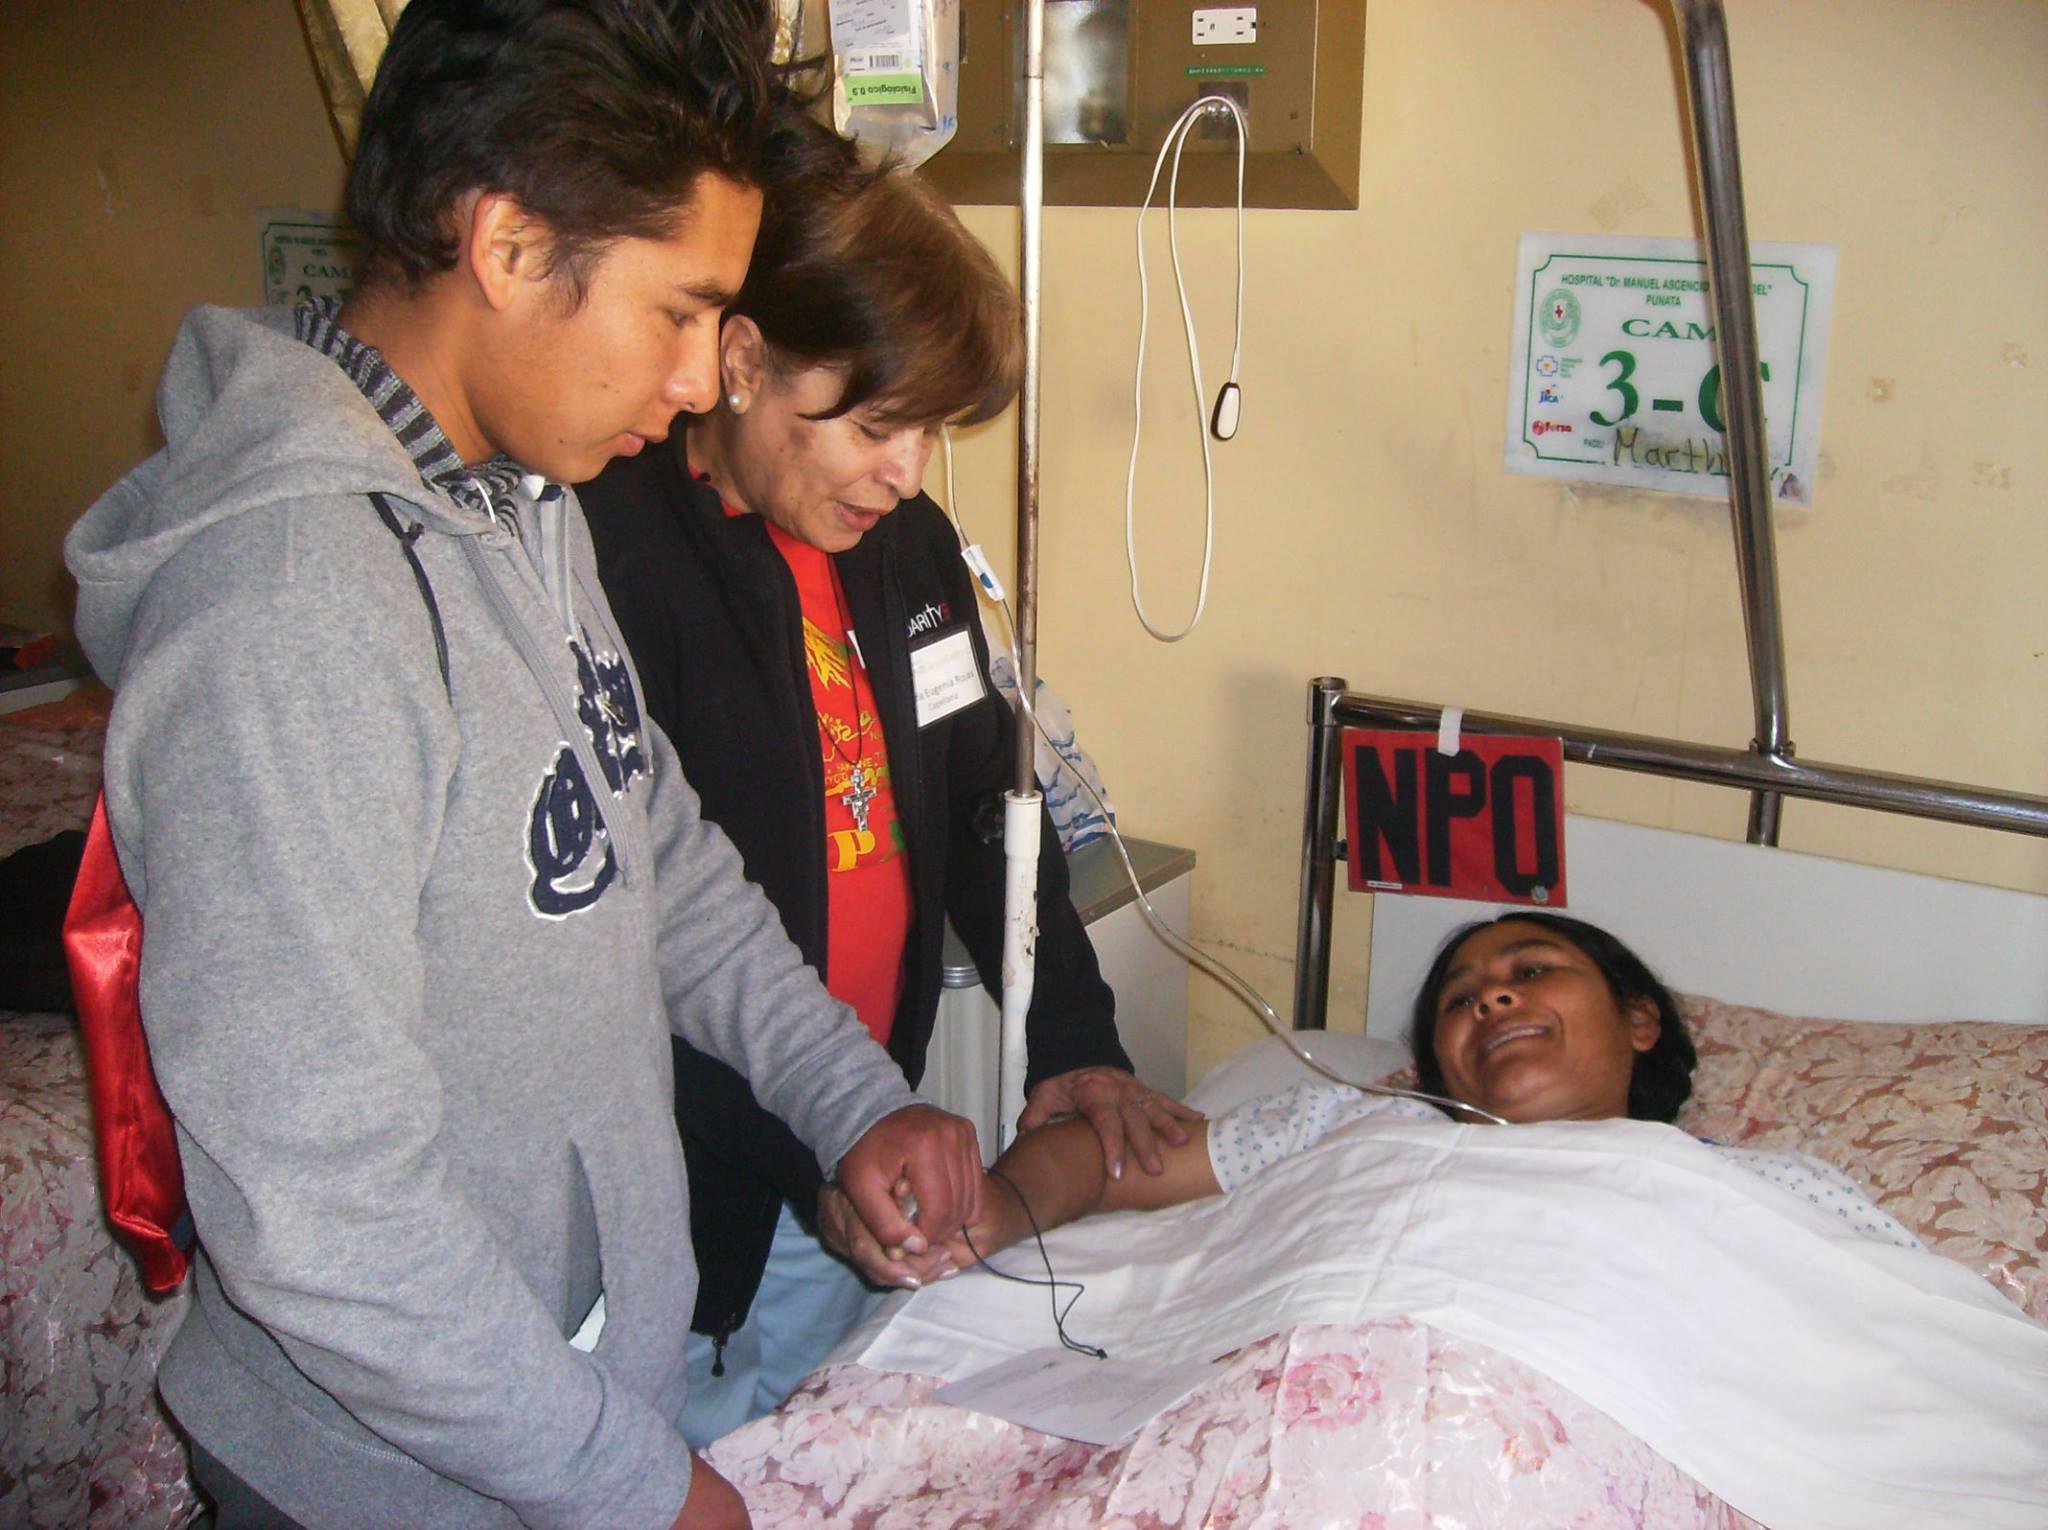 Puente de Solidaridad Board Member and Chaplain, María Eugenia Rojas, prays with a patient and her son.